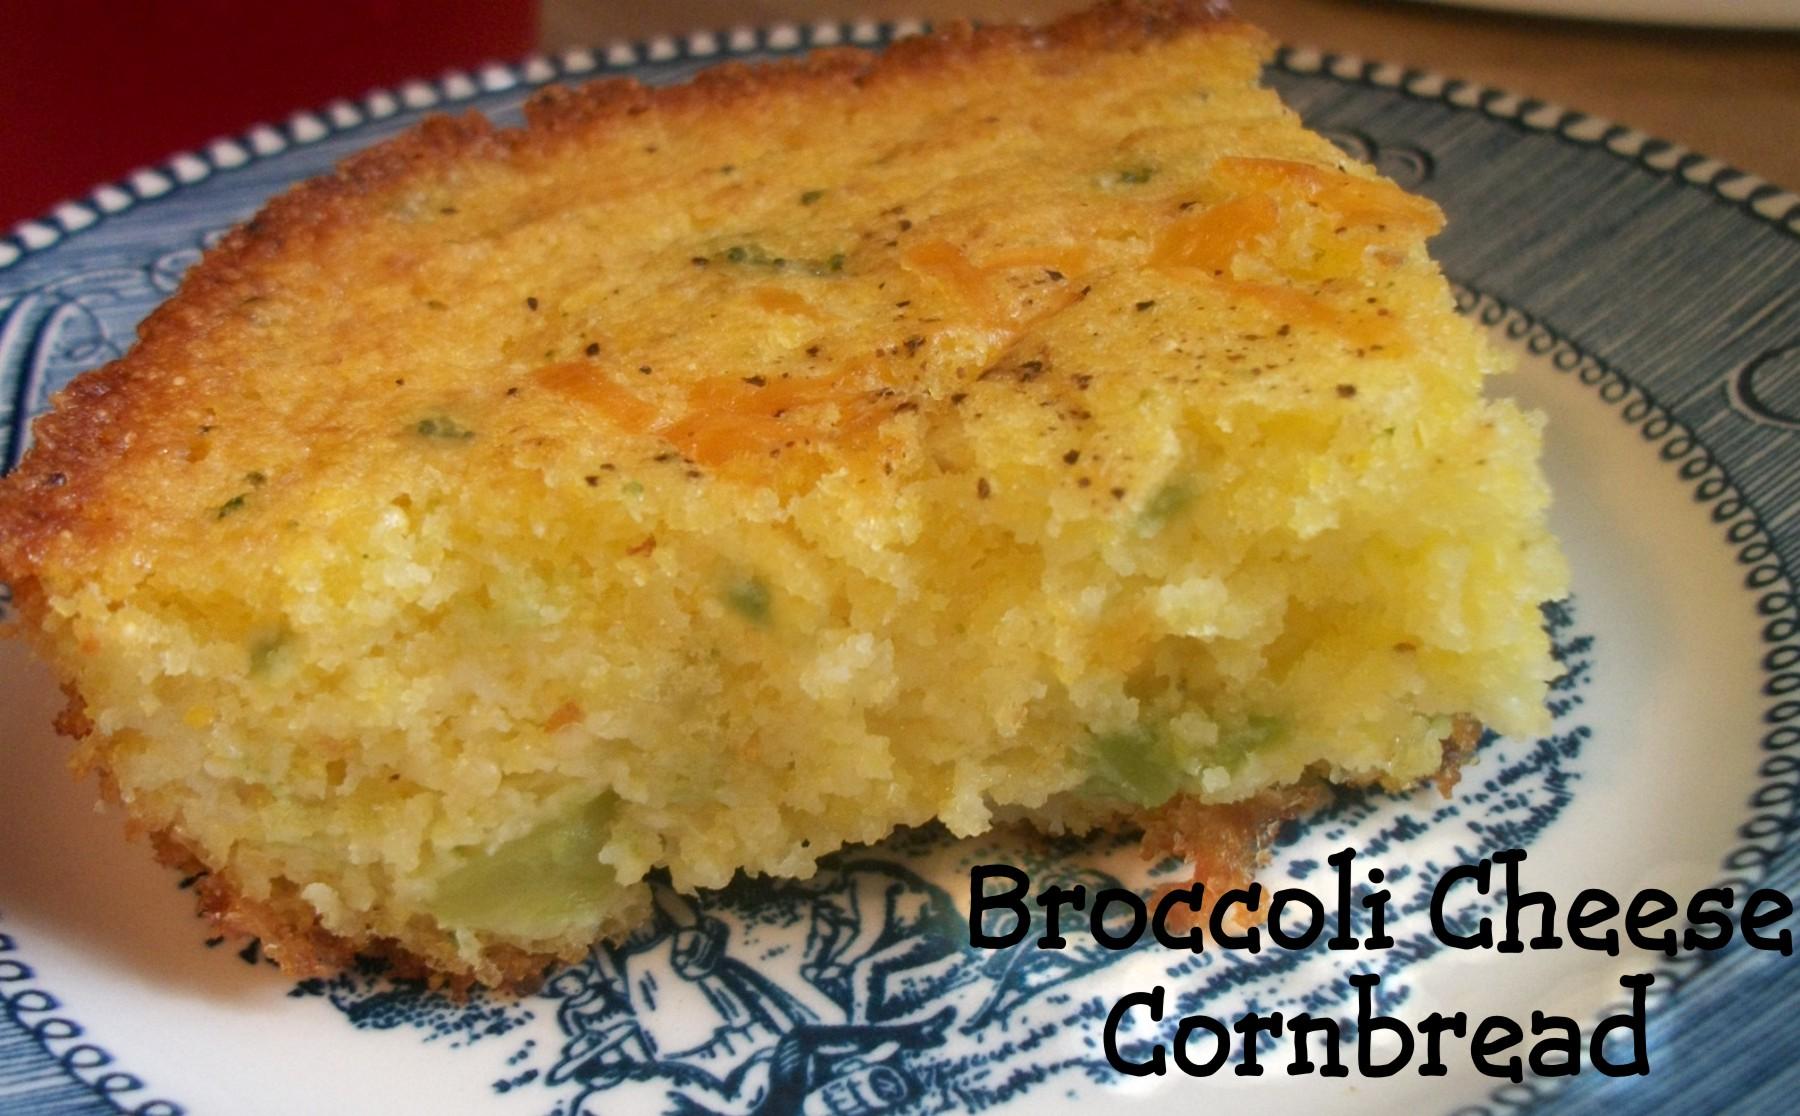 ... cornbread stuffing best cornbread stuffing homesteader cornbread